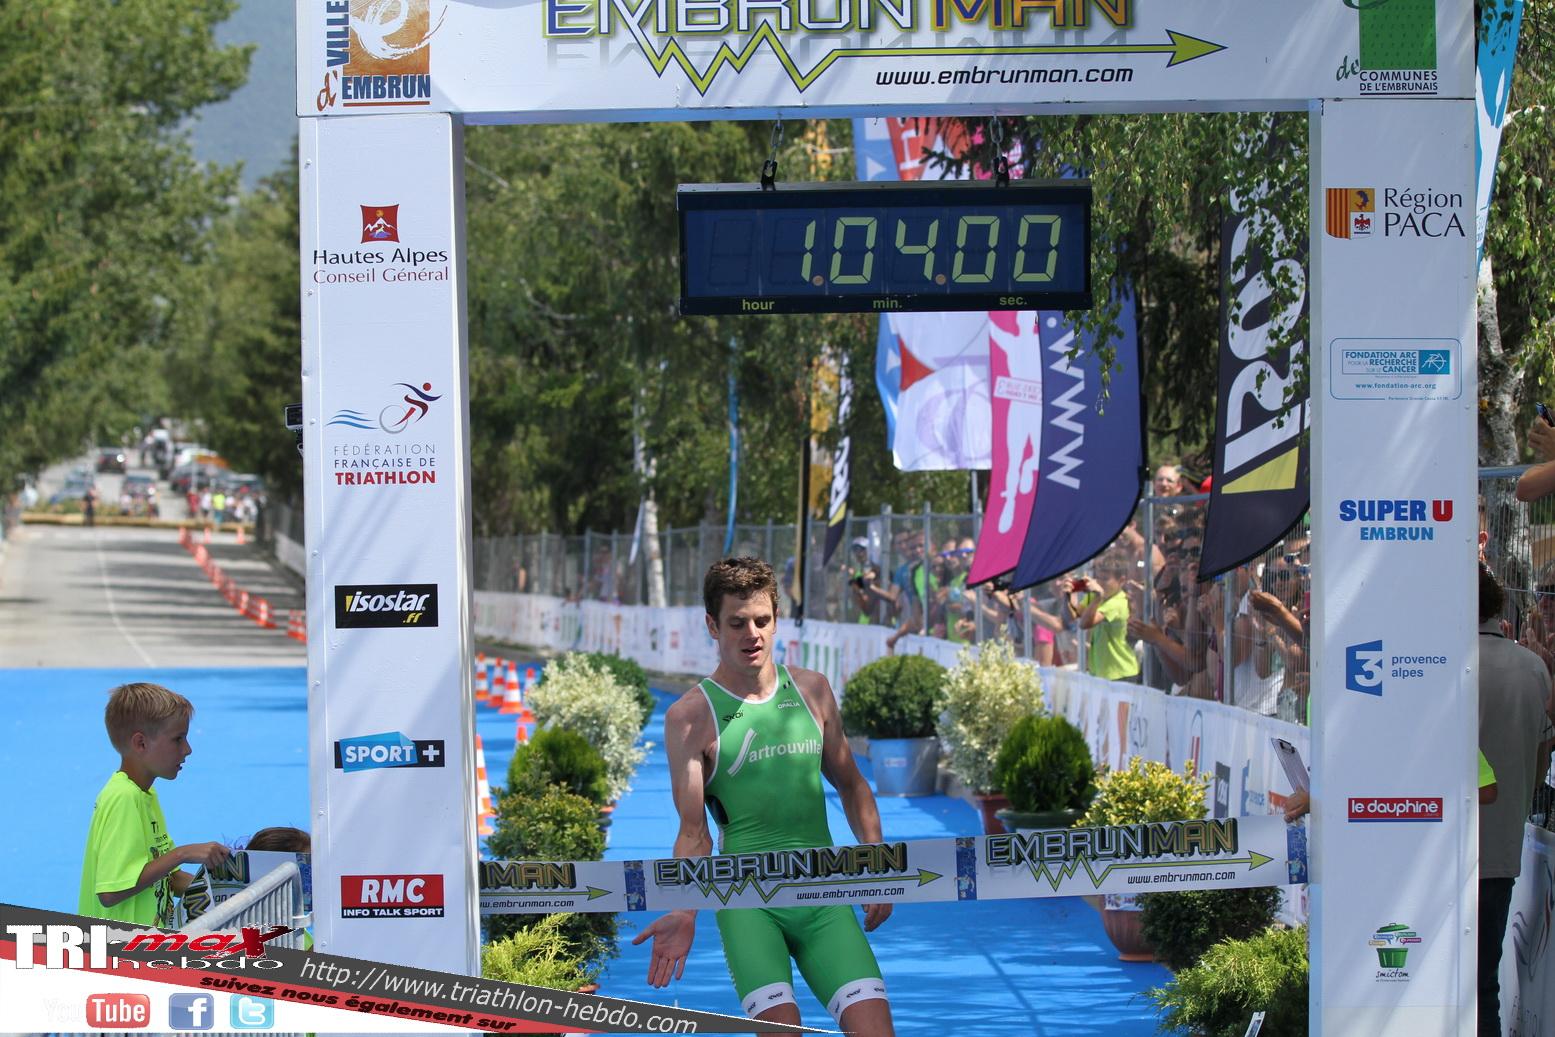 GP Hommes à Embrun : Jonathan Brownlee et Sartrouville…